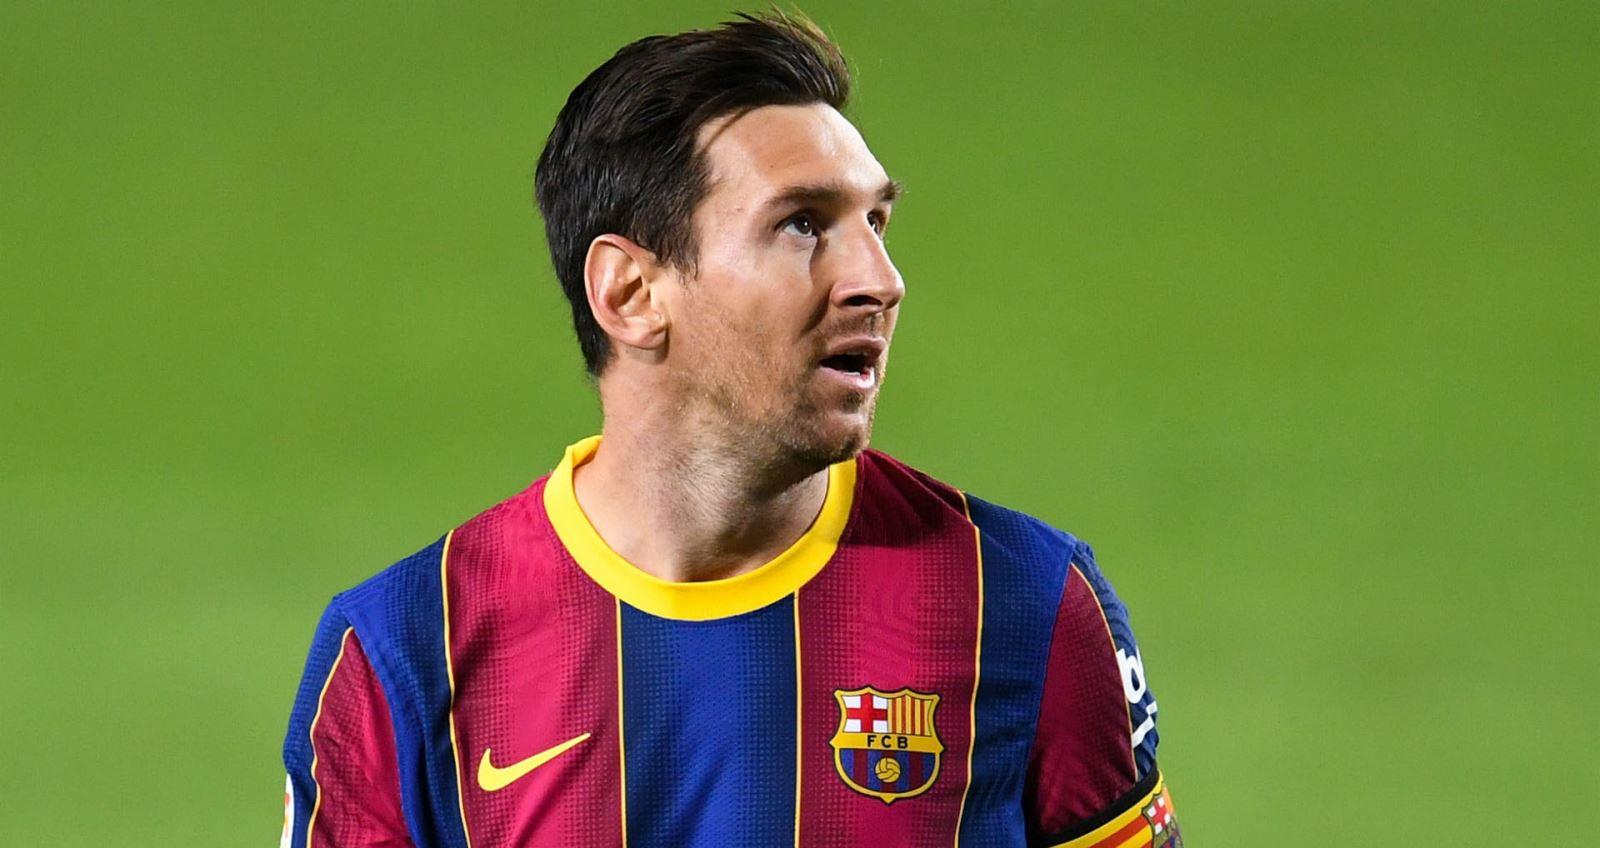 MU, manchester united, bóng đá, bóng đá hôm nay, Ibrahimovic, ac milan, manchester city, messi, barcelona, bruno fernandes, penalty, newcastle